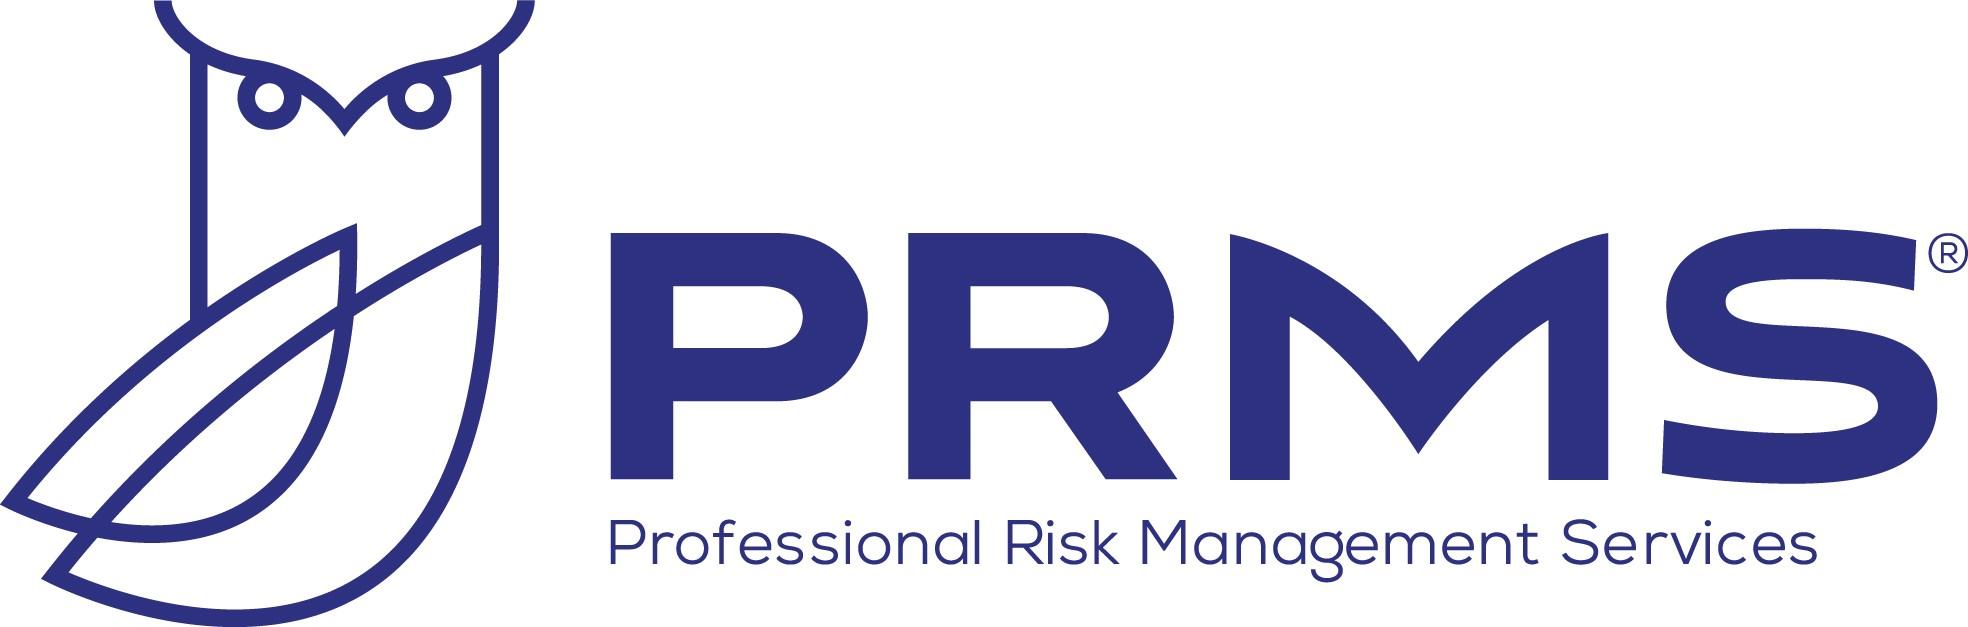 Professional Risk Management Services